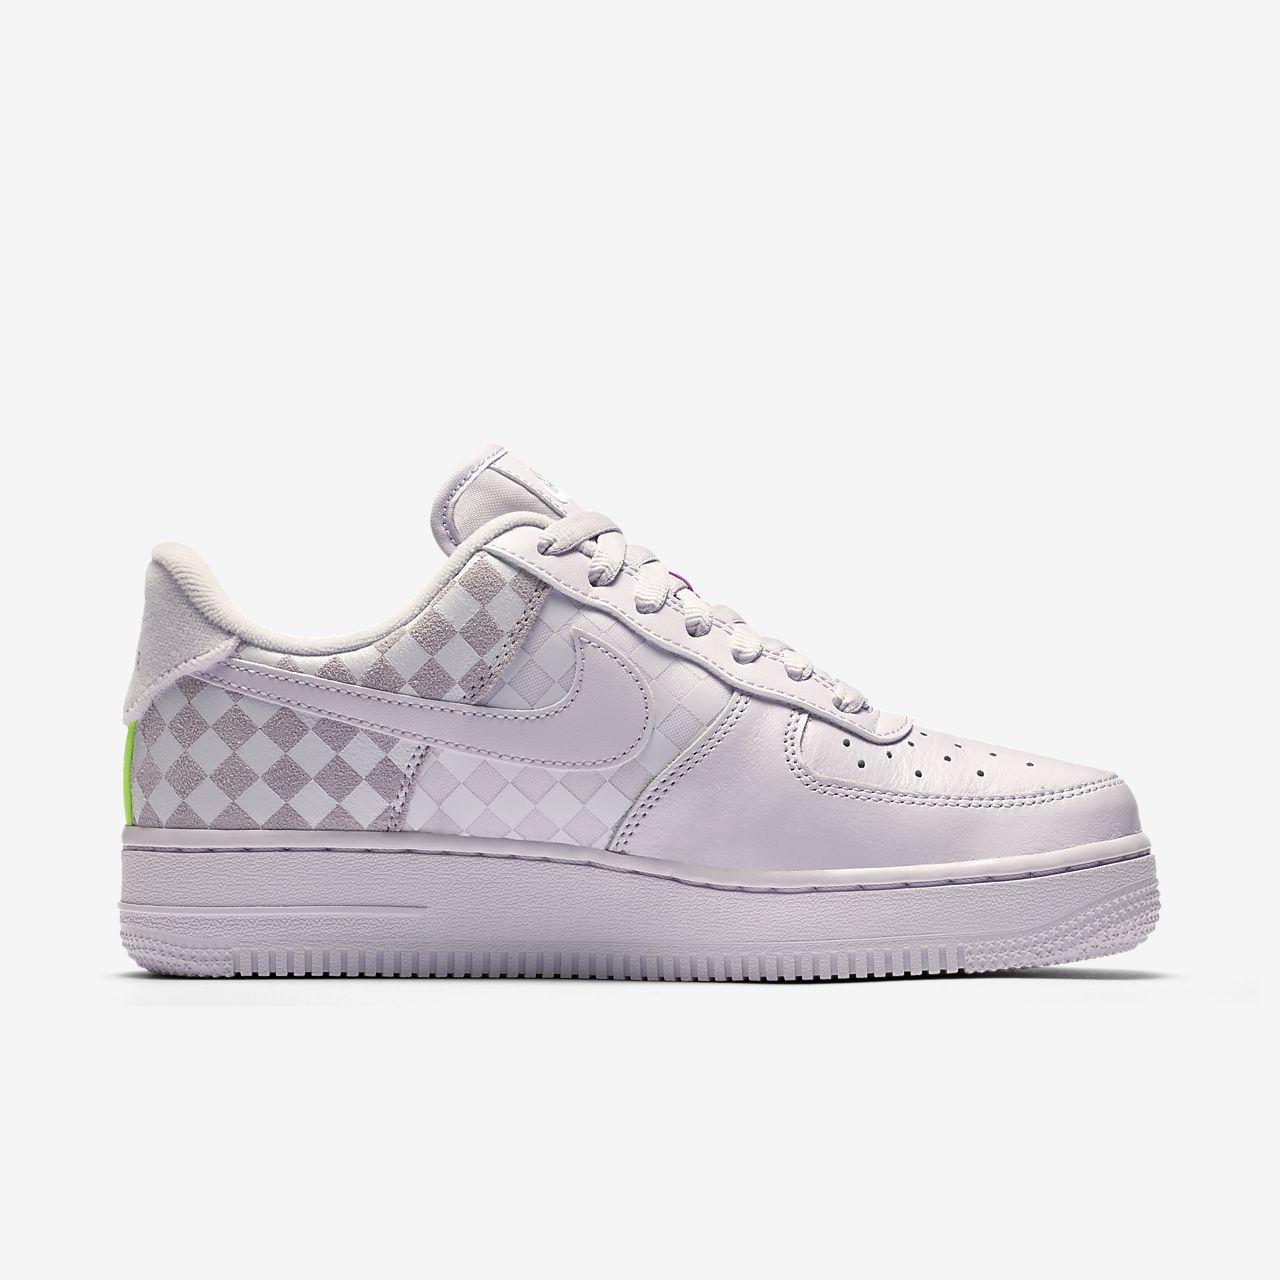 Nike Air Force 1 Low Damen-Trainingsschuh